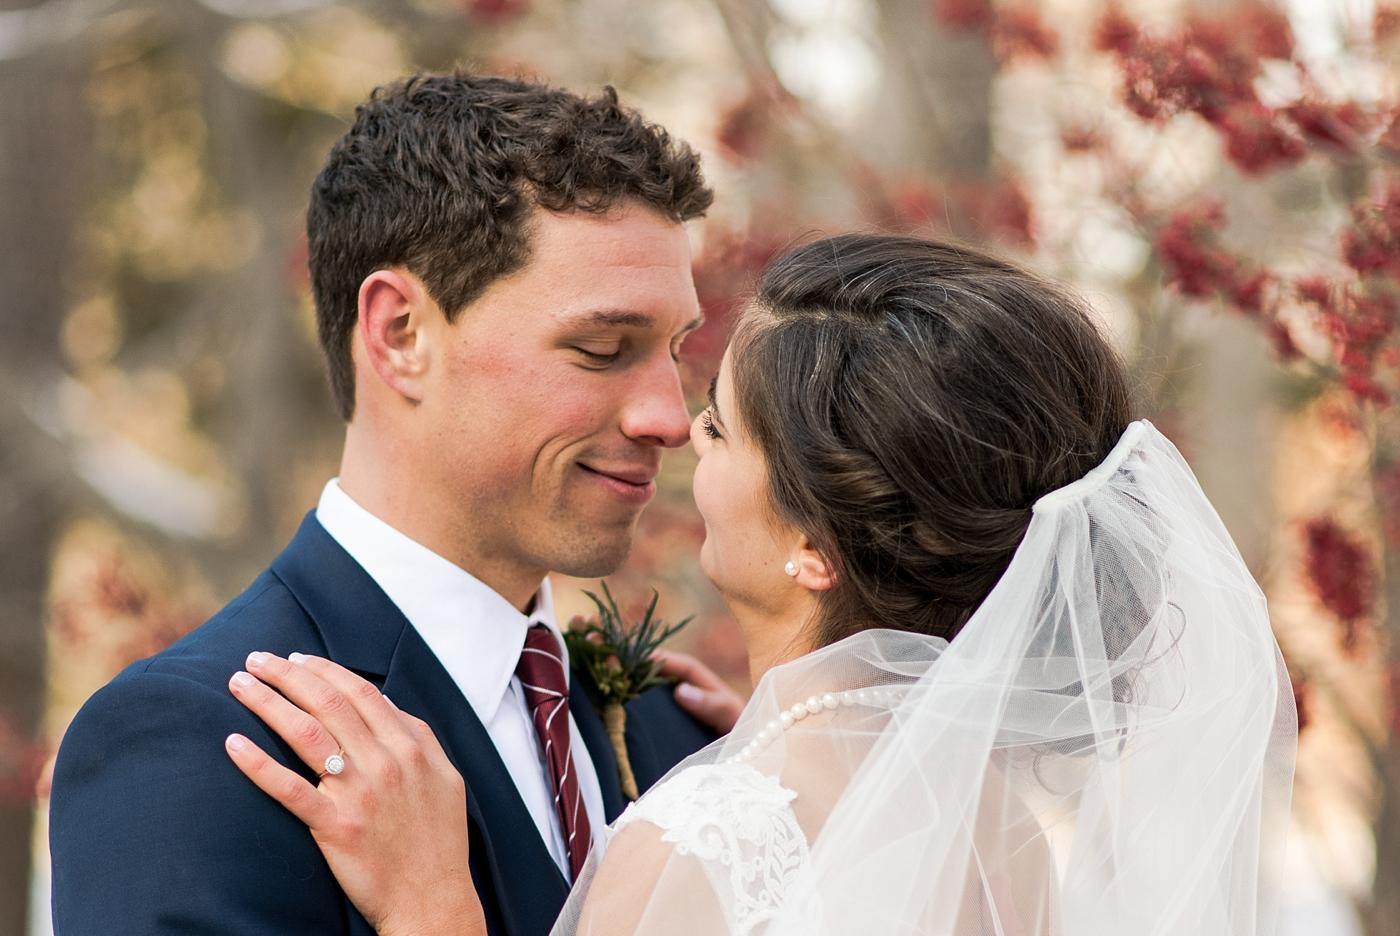 indianapolis-top-rated-wedding-photographers_0444.jpg